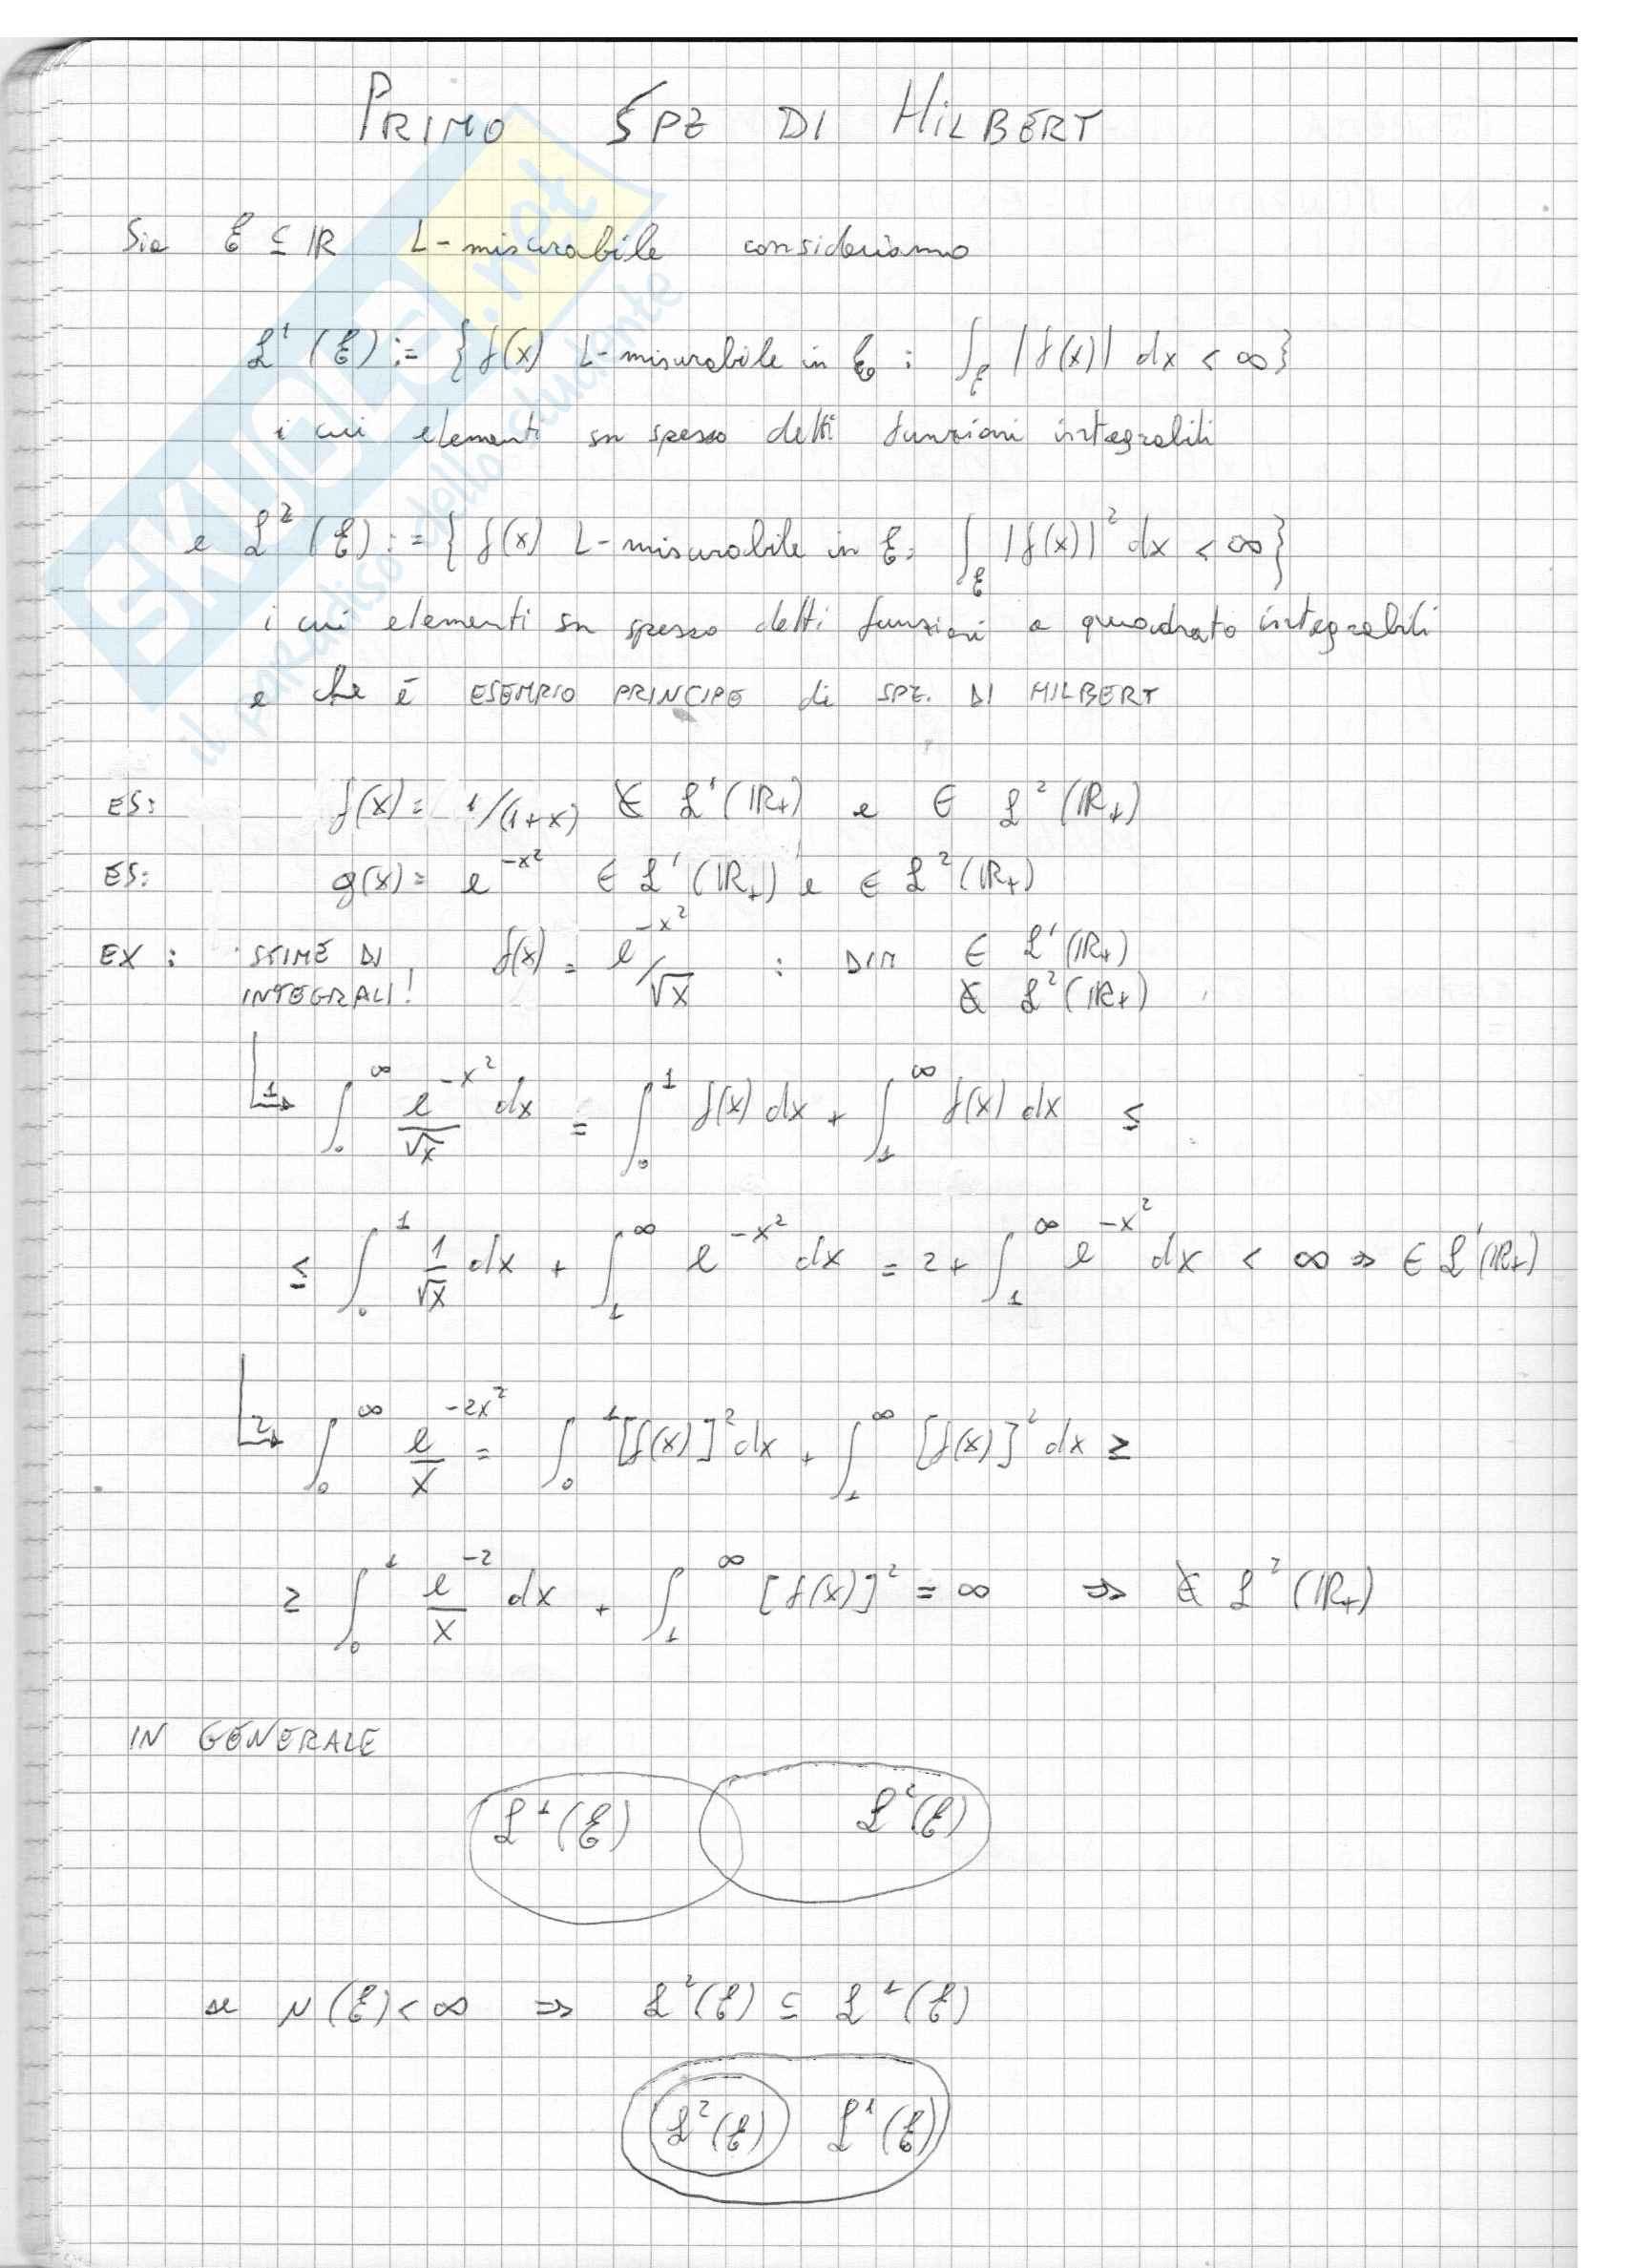 Fisica Matematica Pag. 51